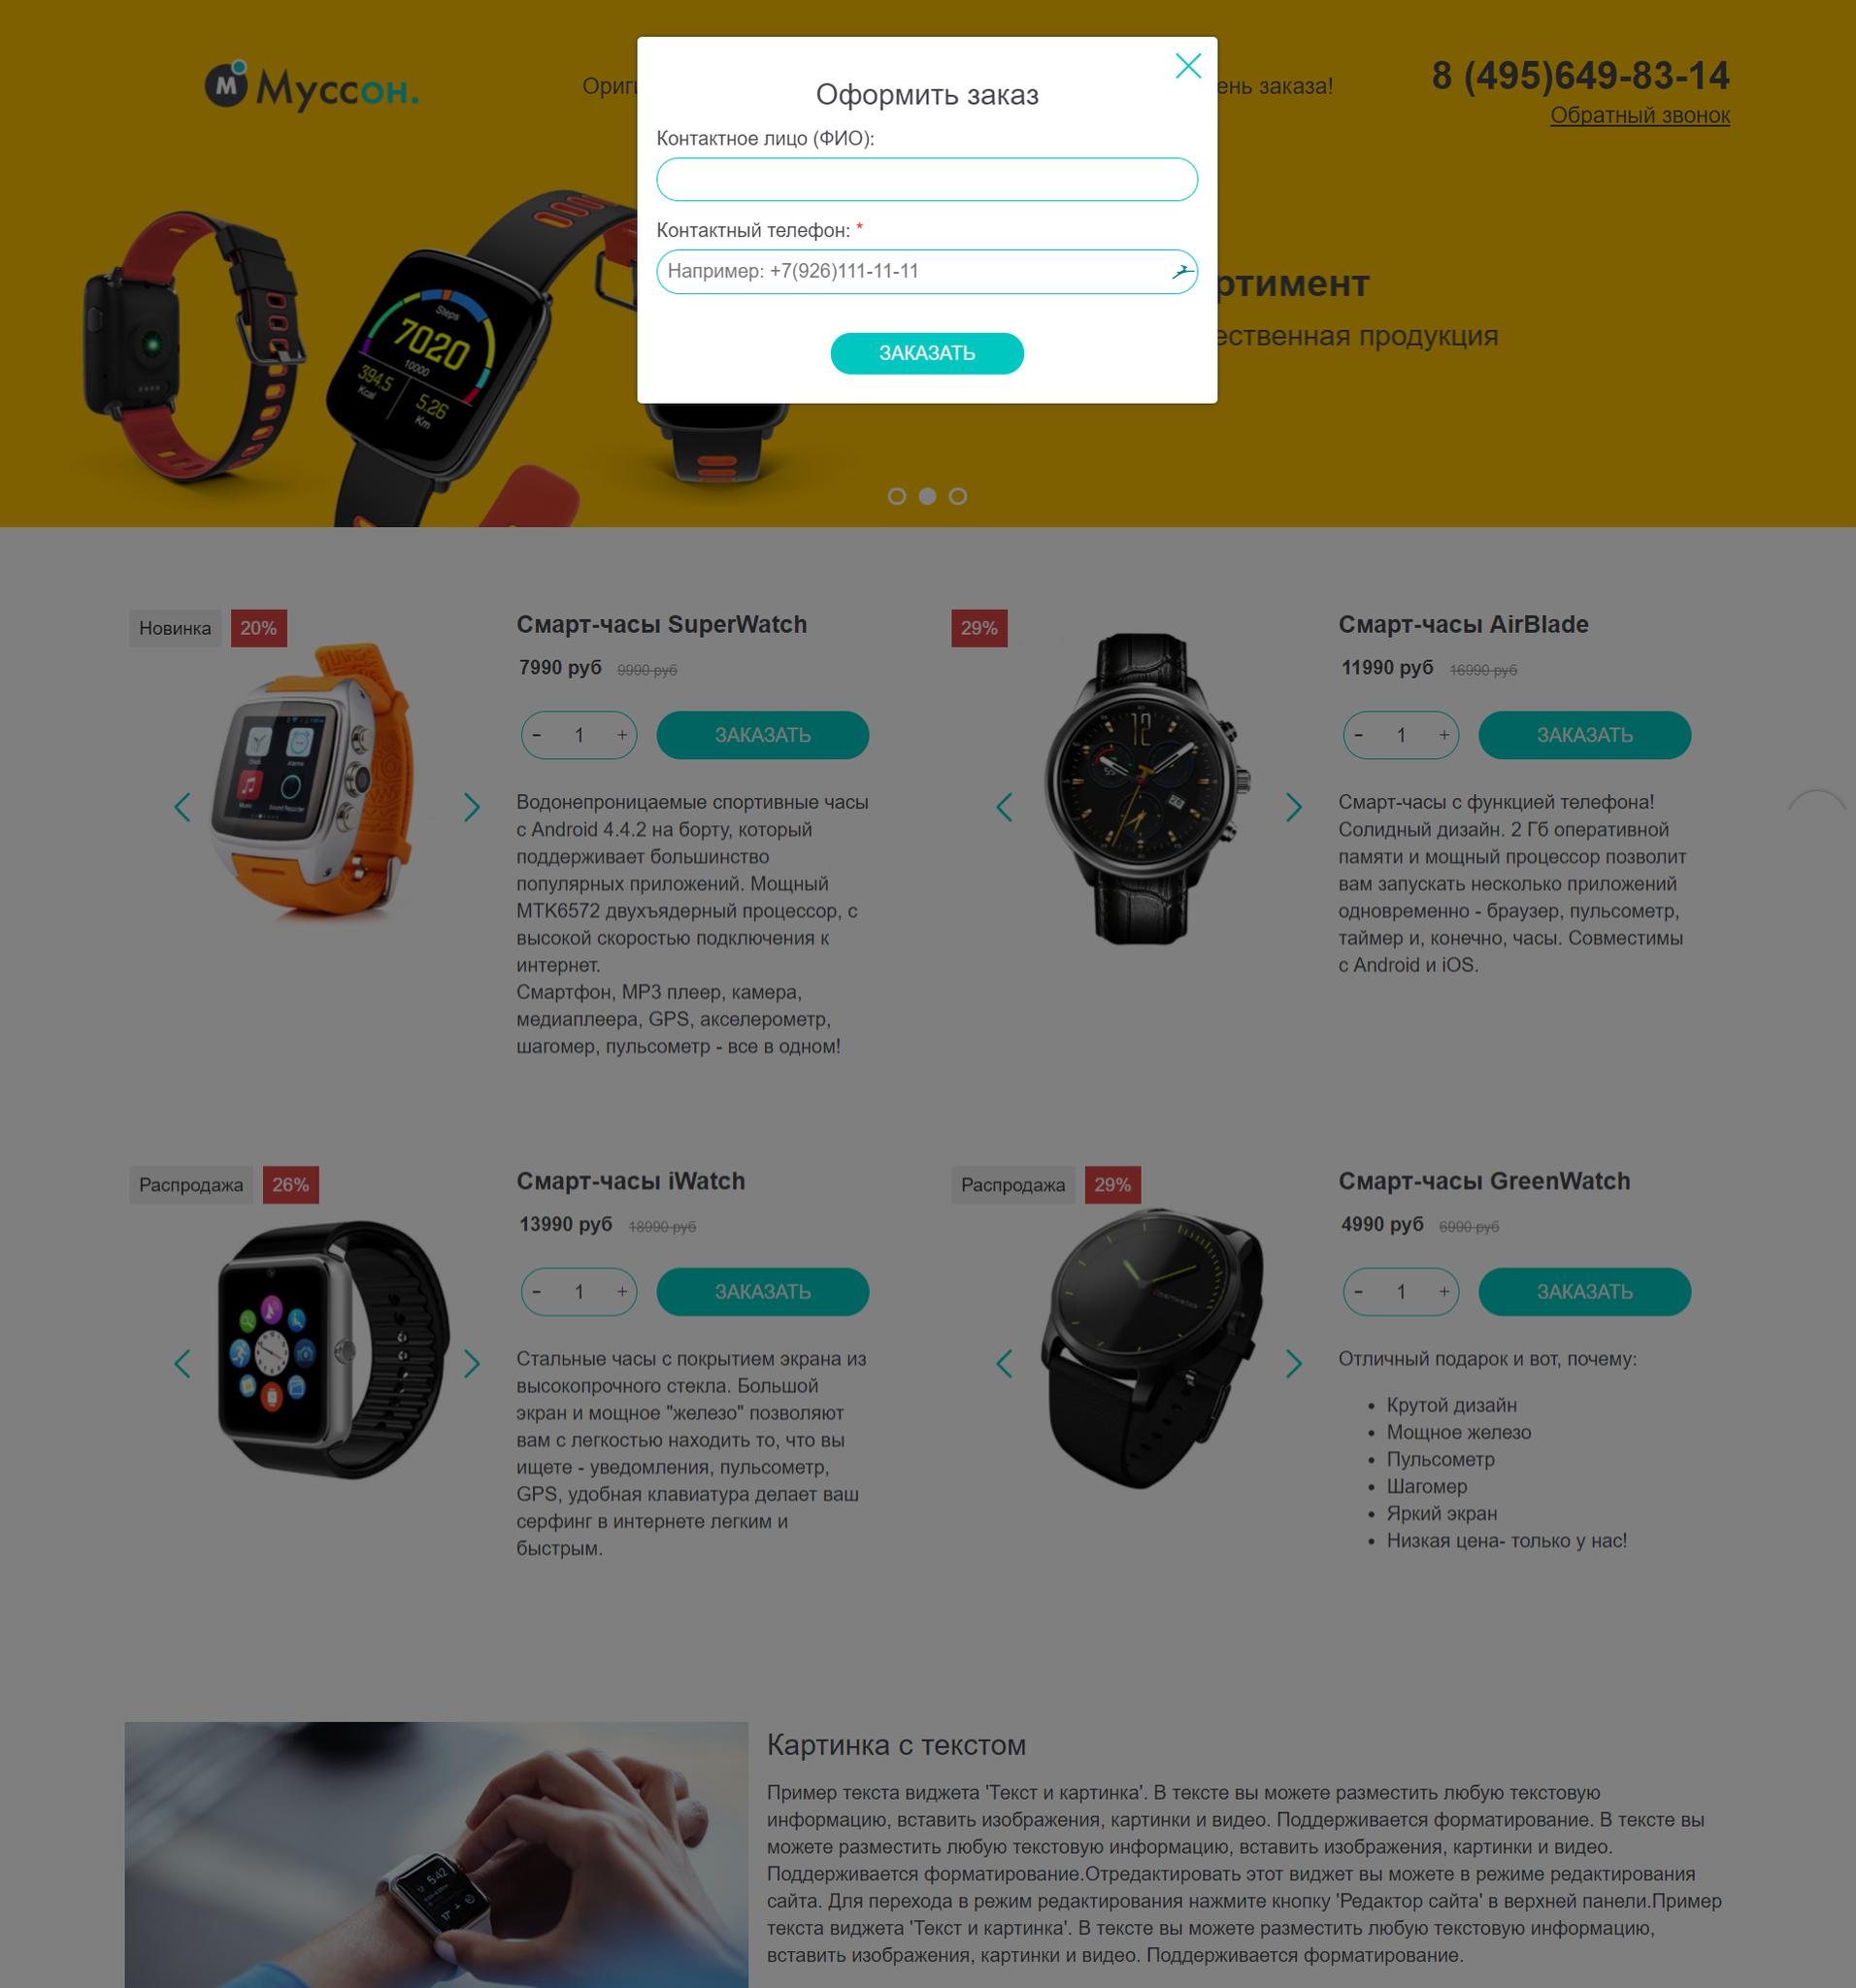 Шаблон интернет магазина - Муссон (лендинг)